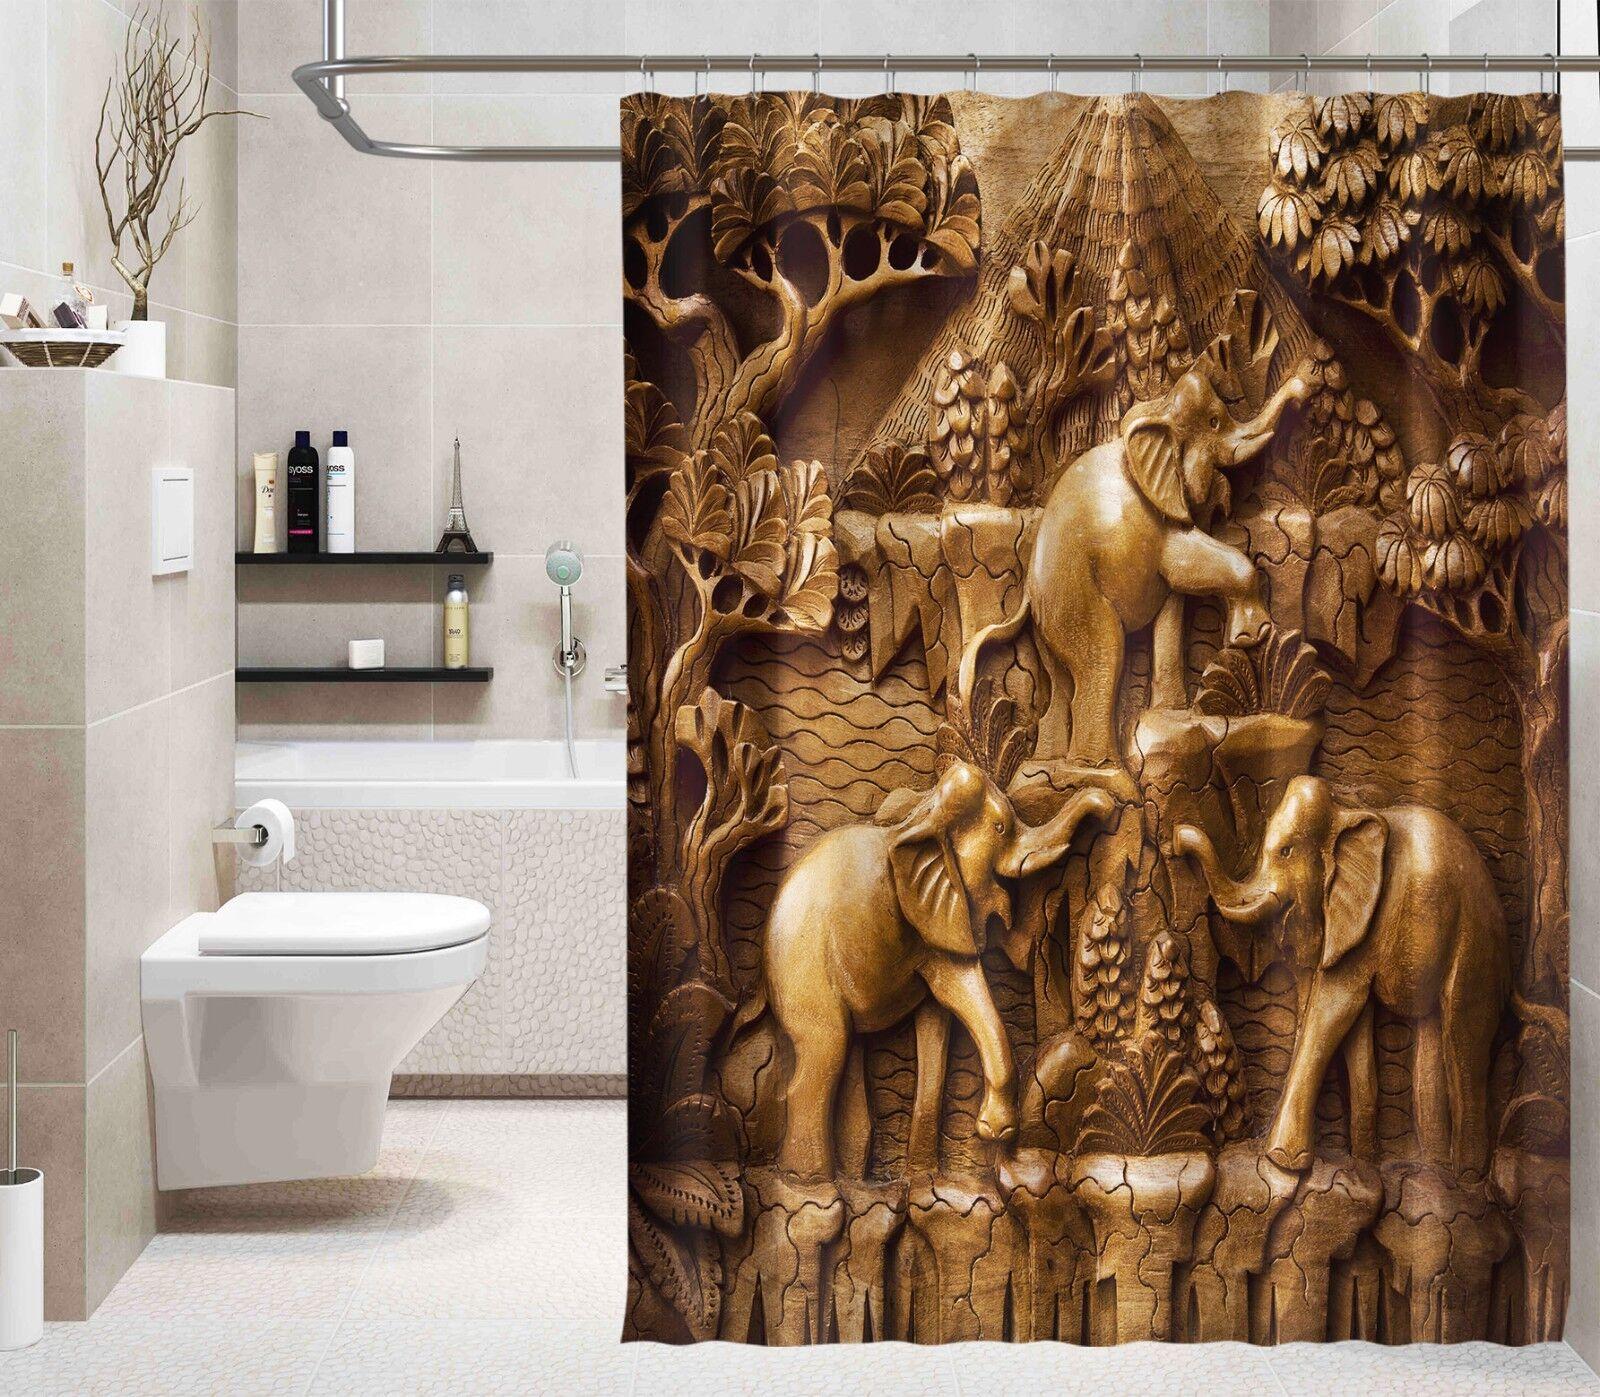 3D Elefant Baum 22 Duschvorhang Wasserdicht Faser Bad Daheim Windows Toilette DE   Ermäßigung